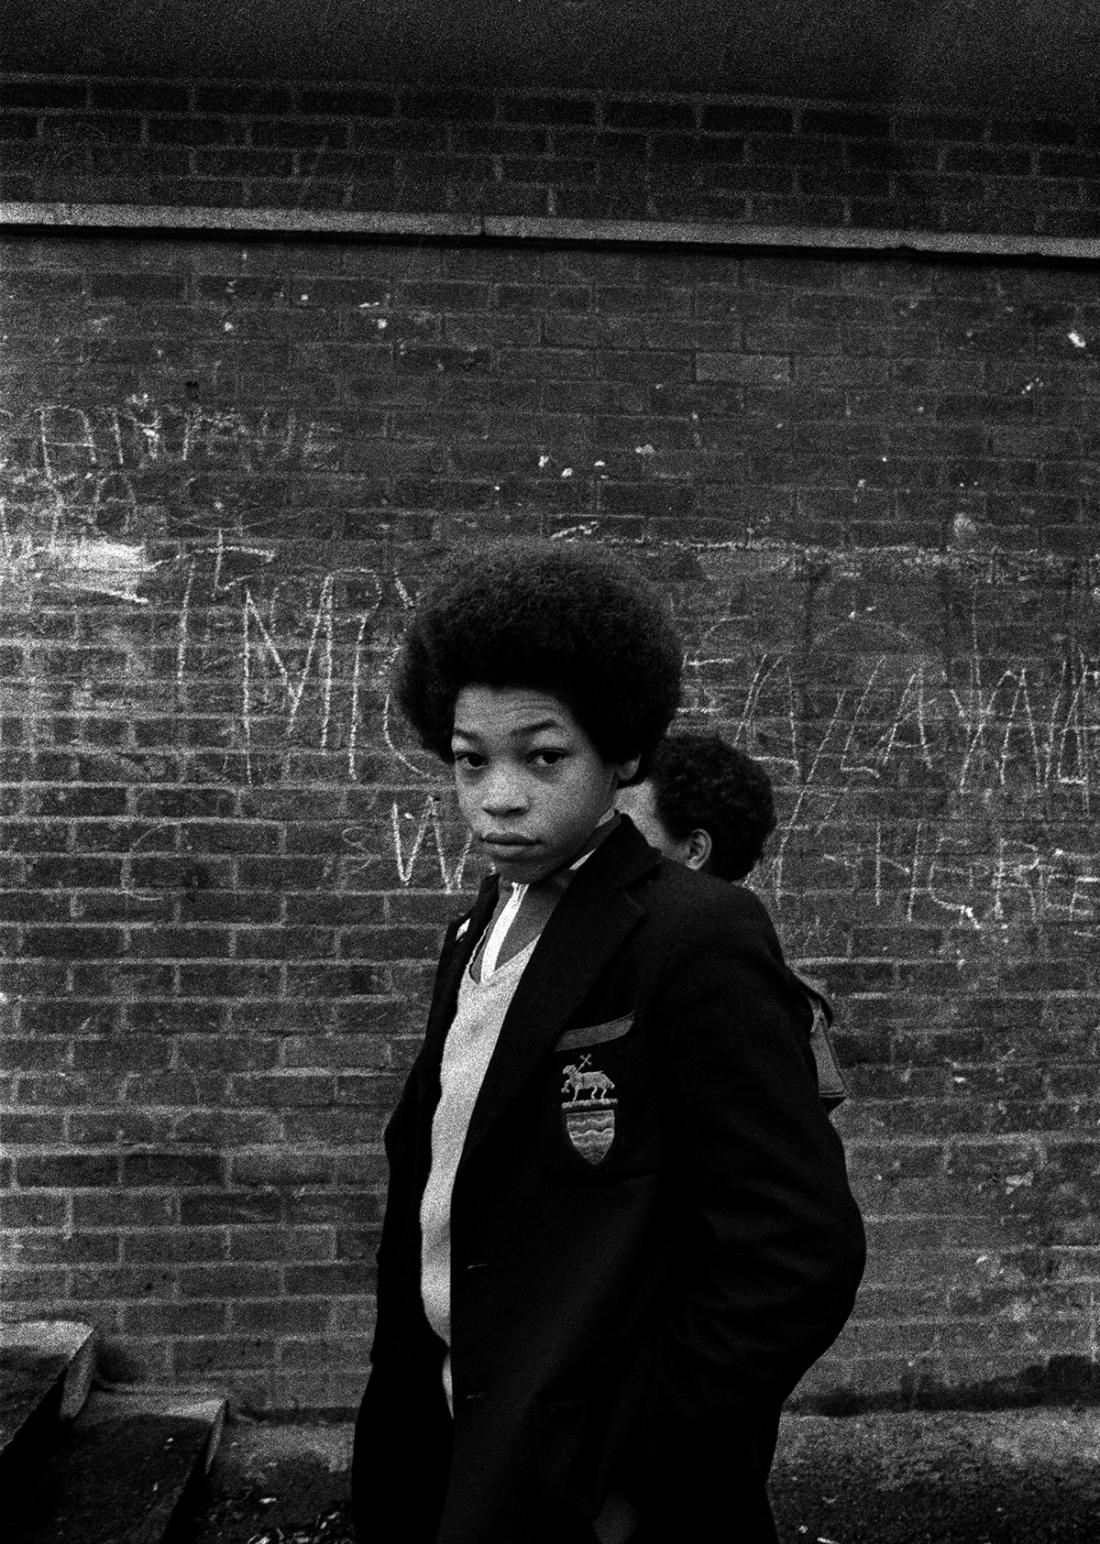 Tulse Hill School Brixton, London 1977